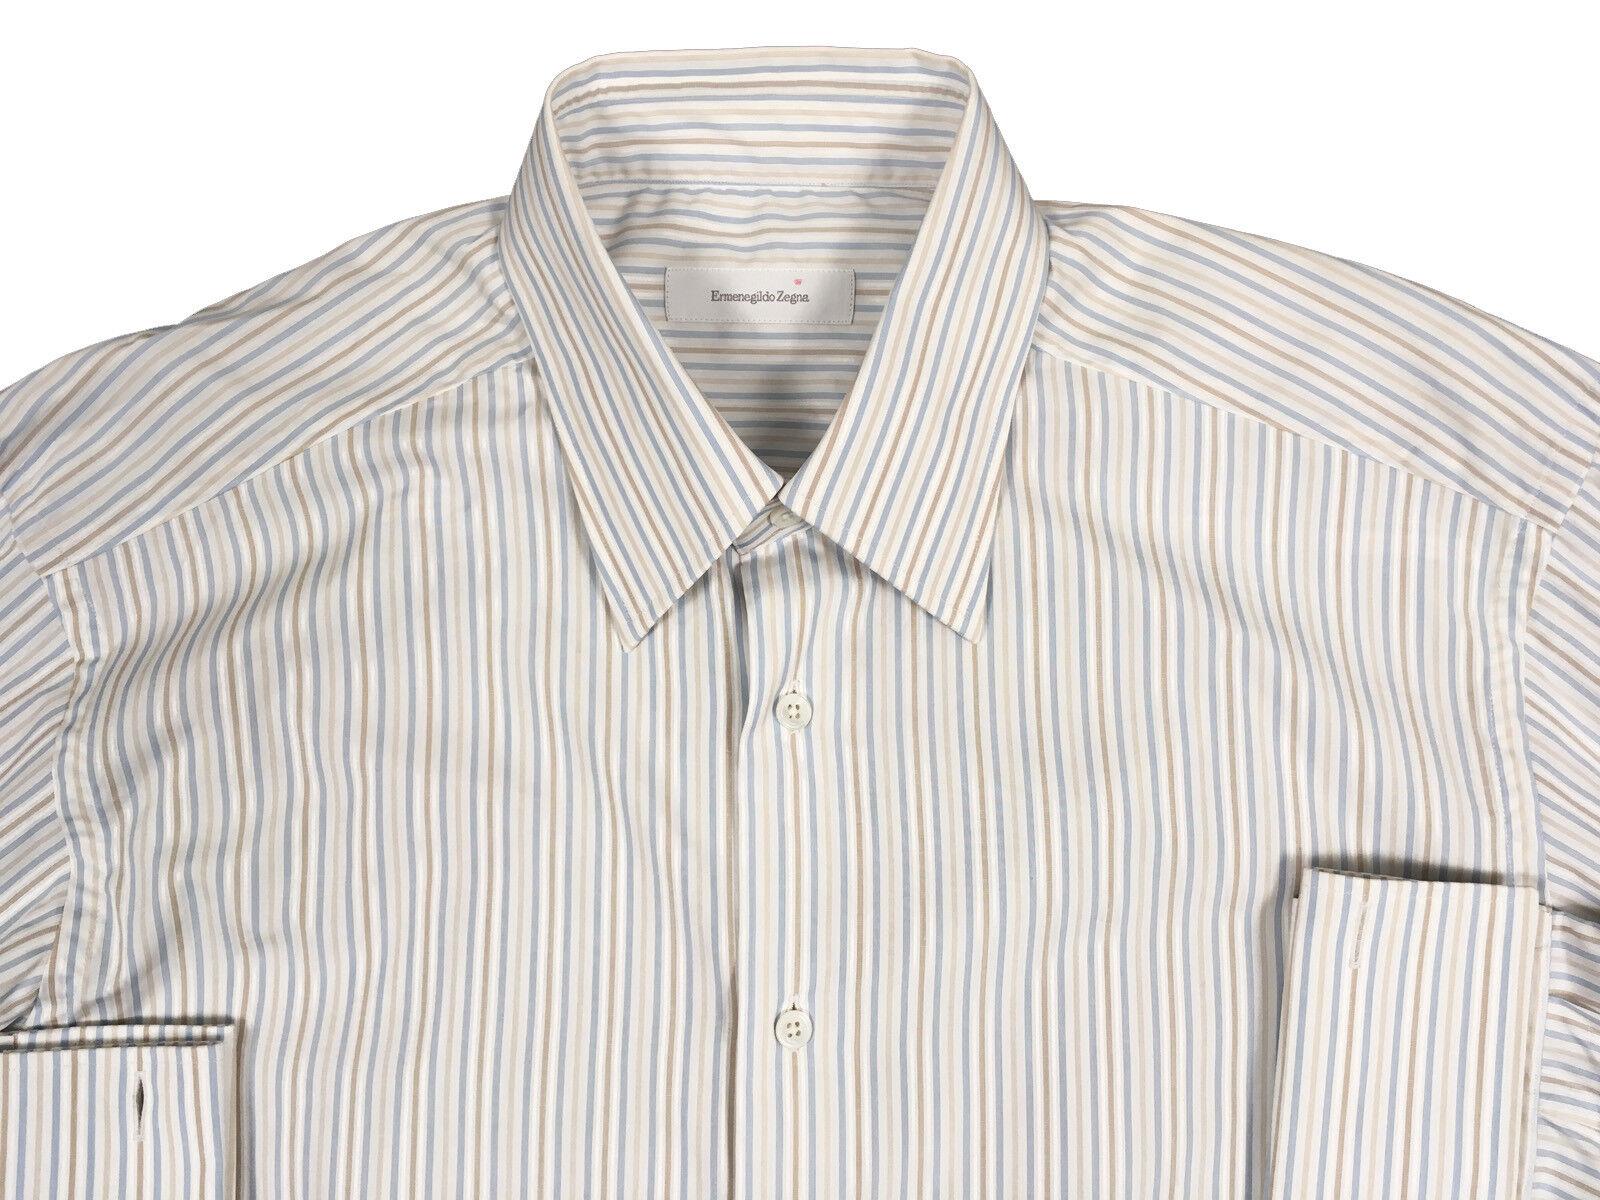 NEW 455 Ermenegildo Zegna French Cuff Dress Shirt  US 17 e 43  Weiß Blau Tan